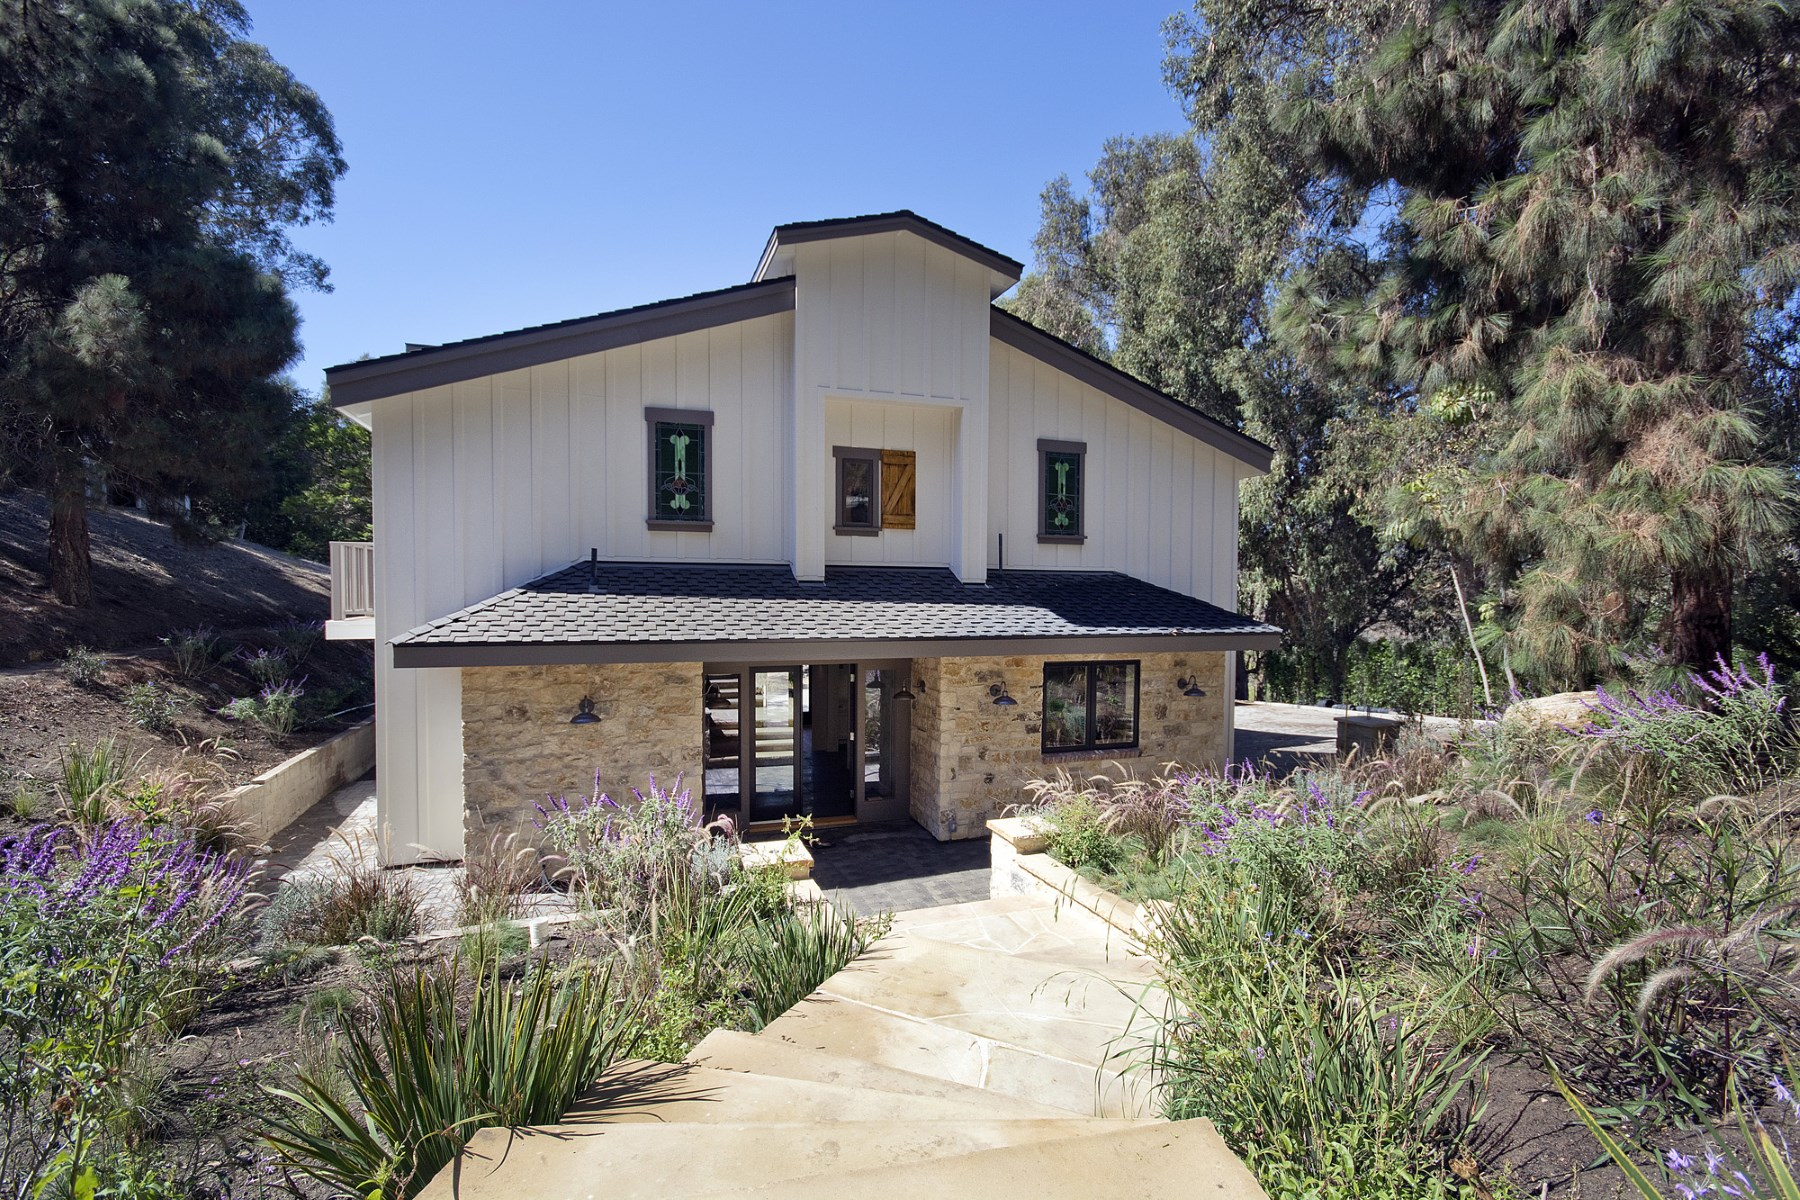 Moradia para Venda às Wonderful Modern Farmhouse in Malibu 6585 Portshead Road Malibu, Califórnia, 90265 Estados Unidos